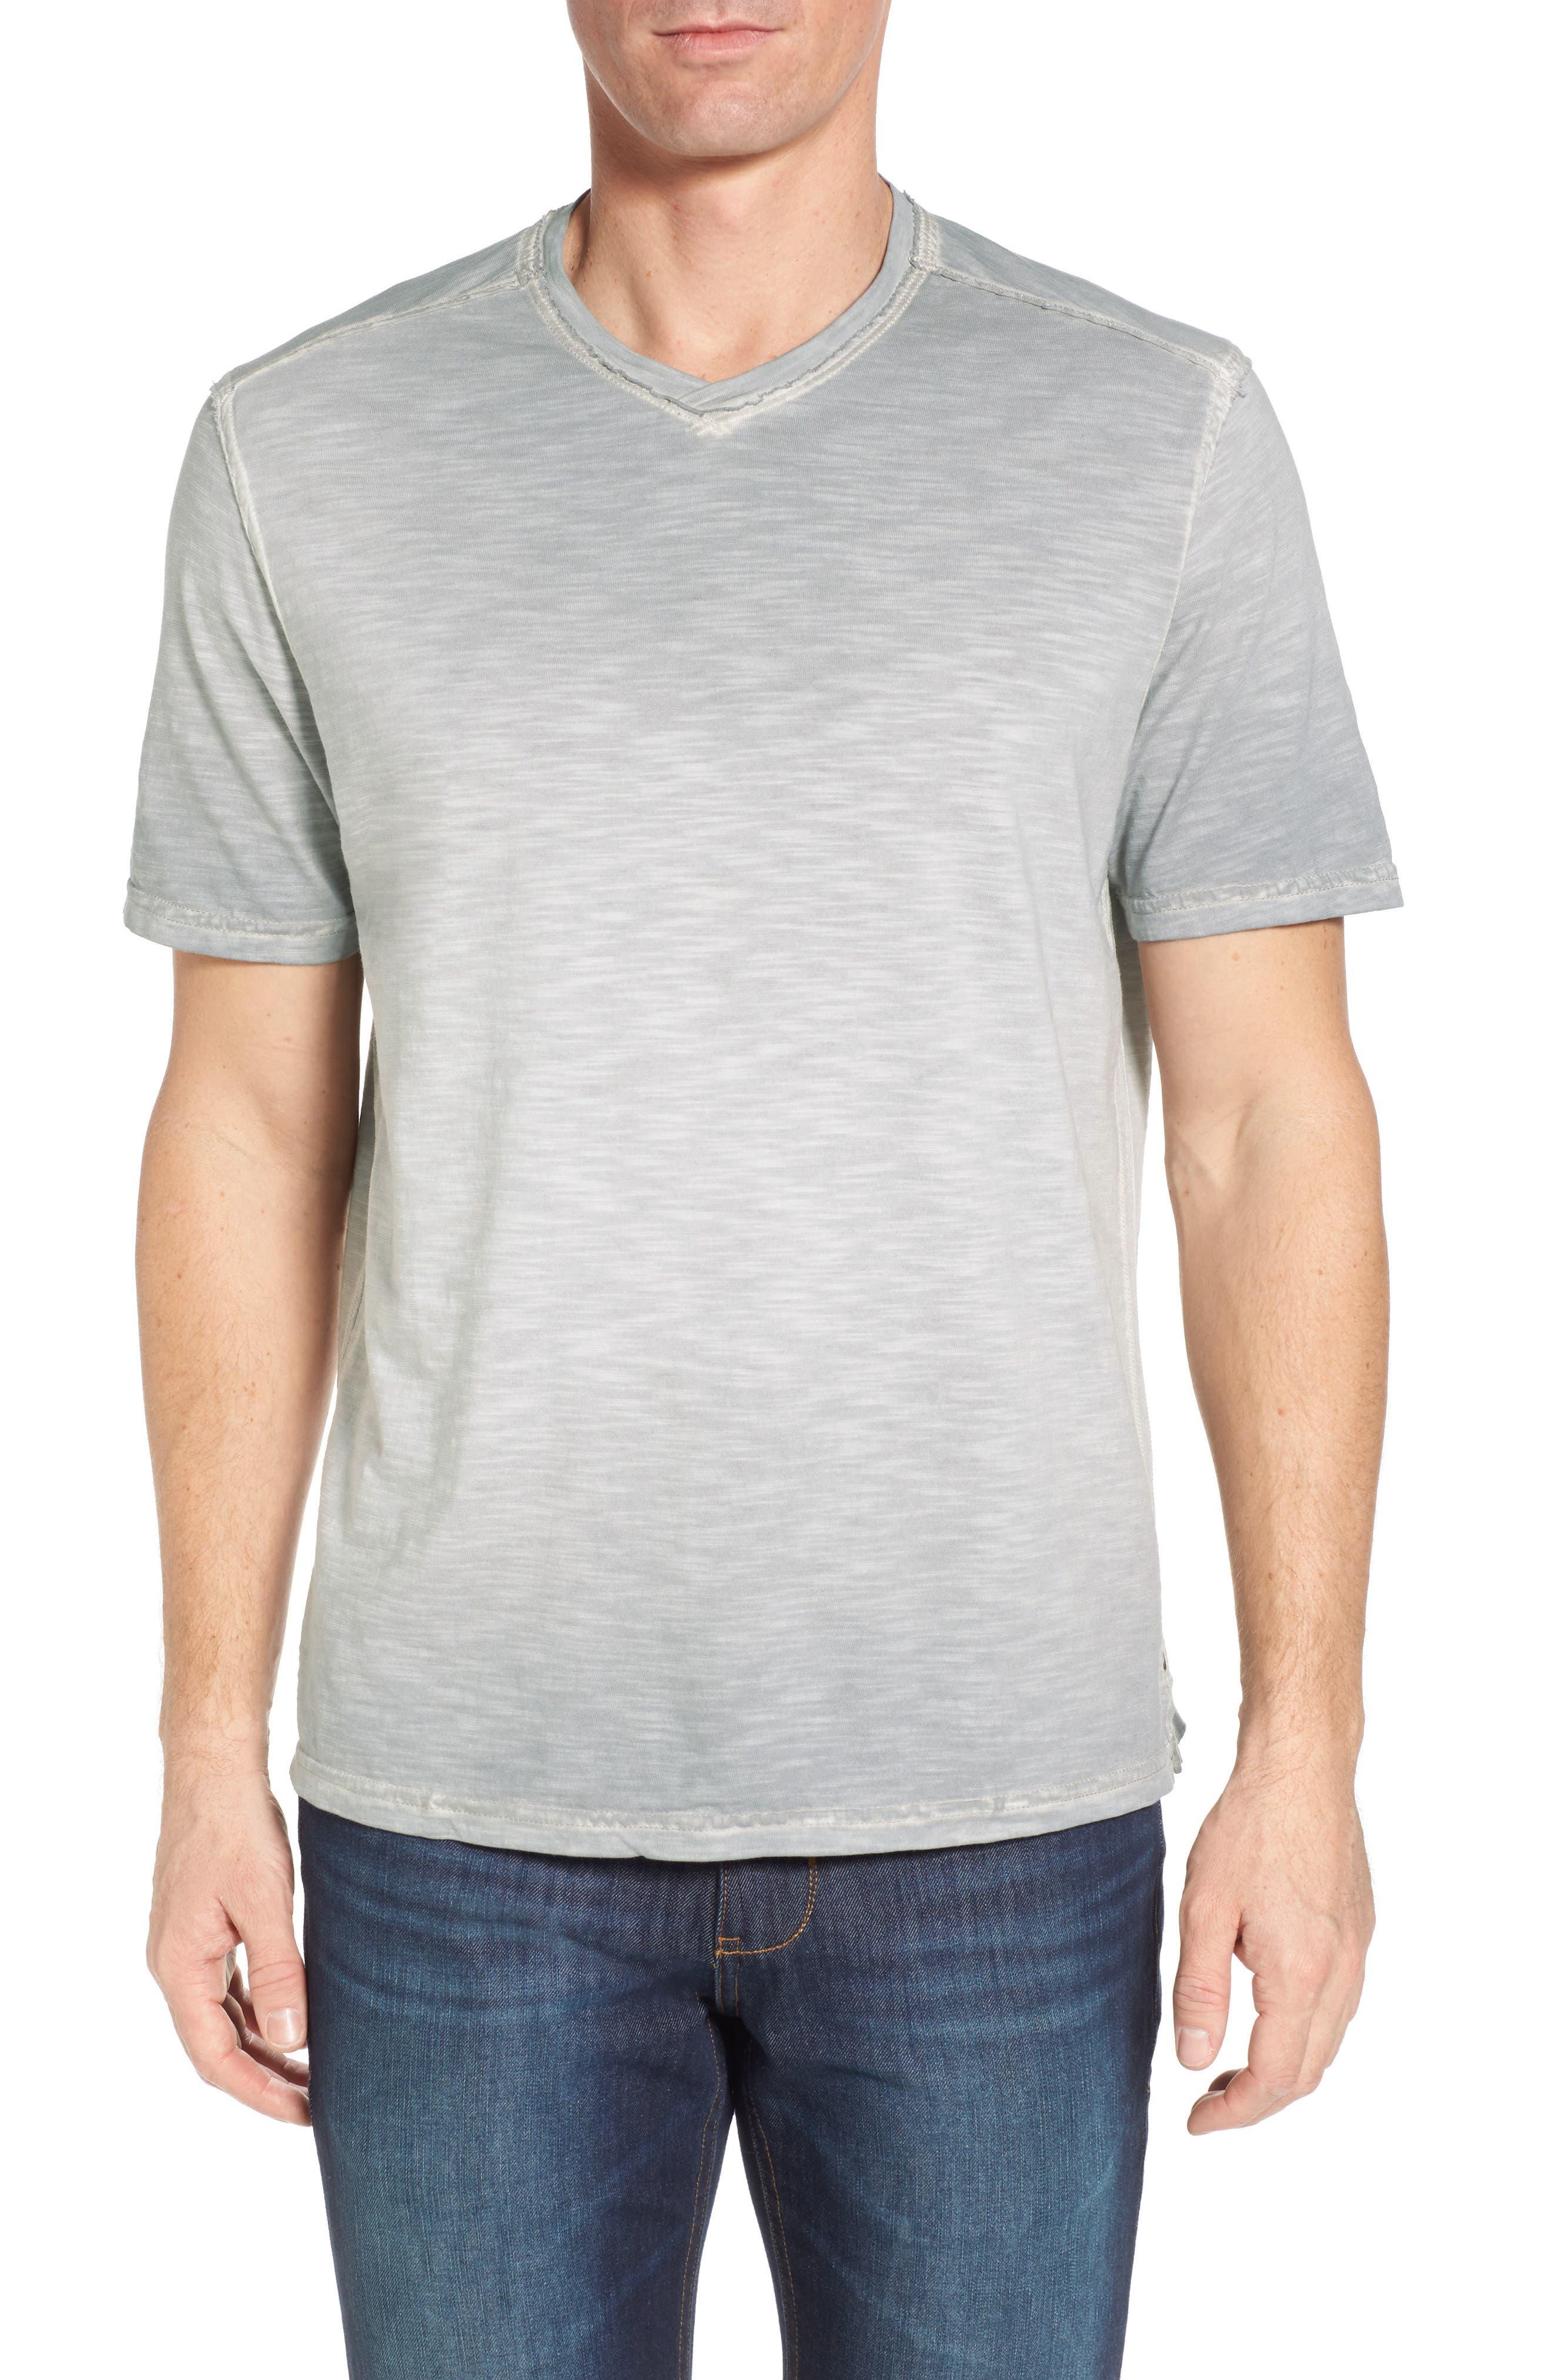 Suncoast Shores V-Neck T-Shirt,                             Main thumbnail 1, color,                             Bala Shark